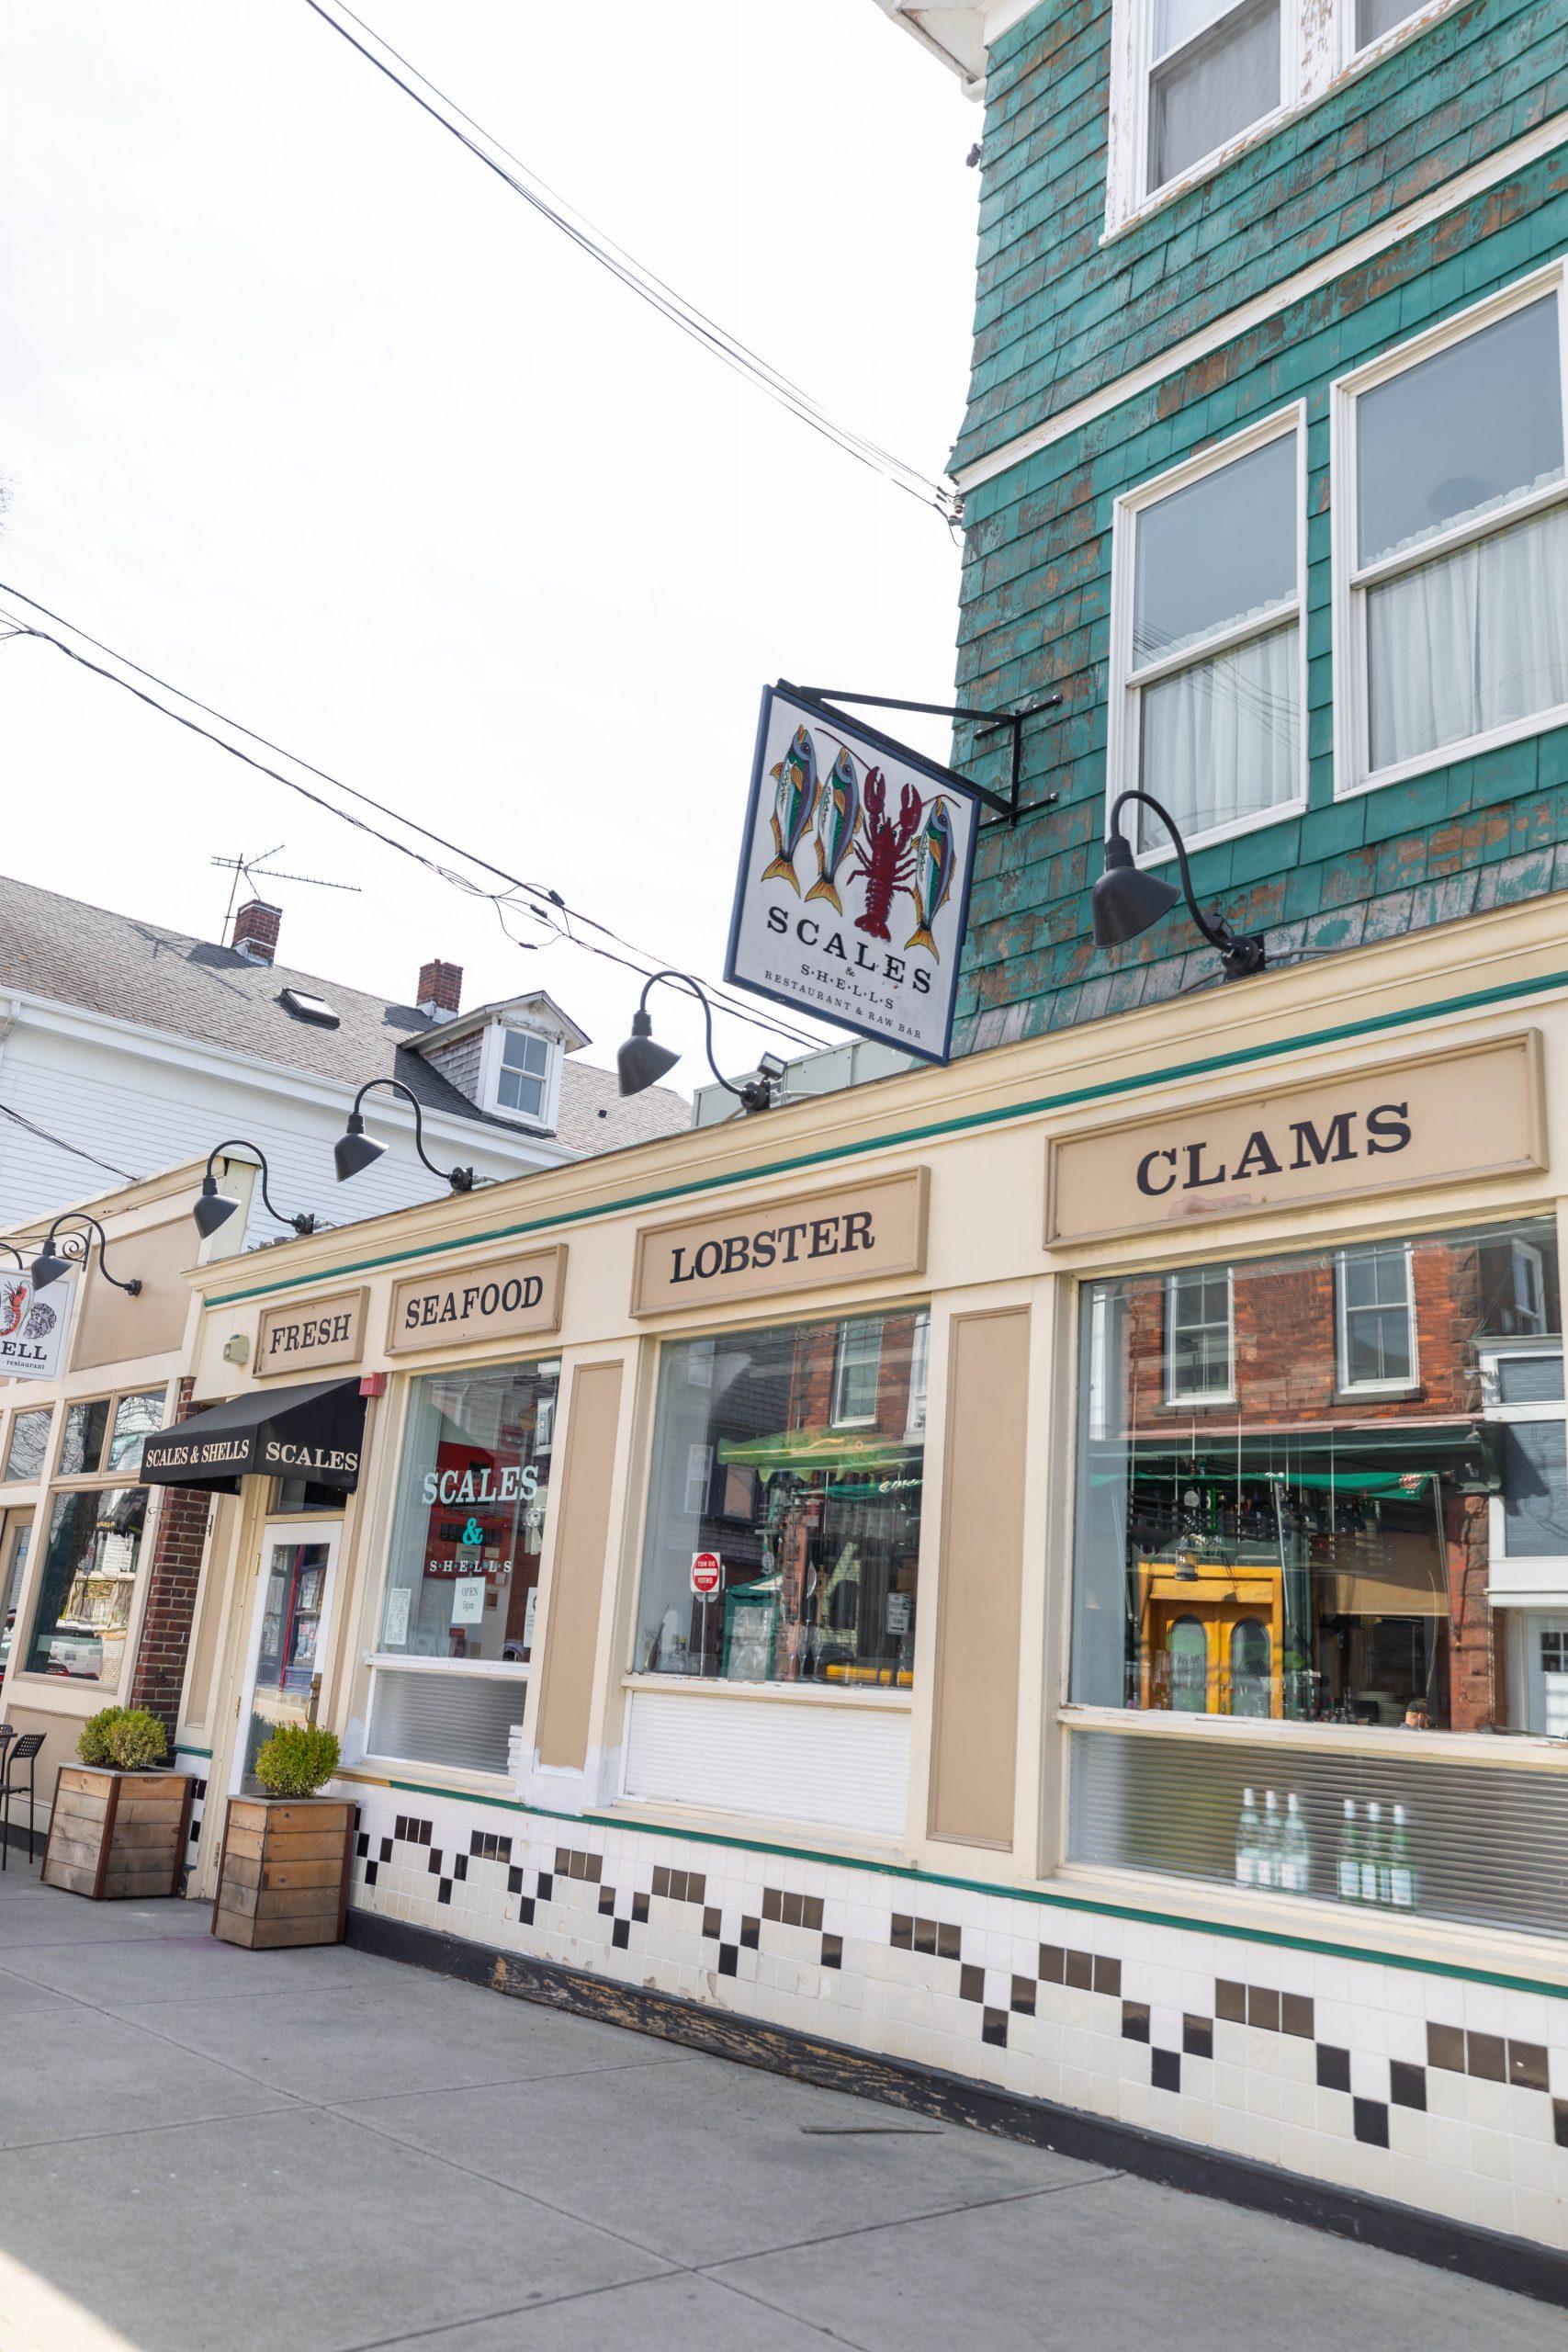 Newport Rhode Island East Coast New England Roadt Trip Bucketlist Photographed by Annie Fairfax